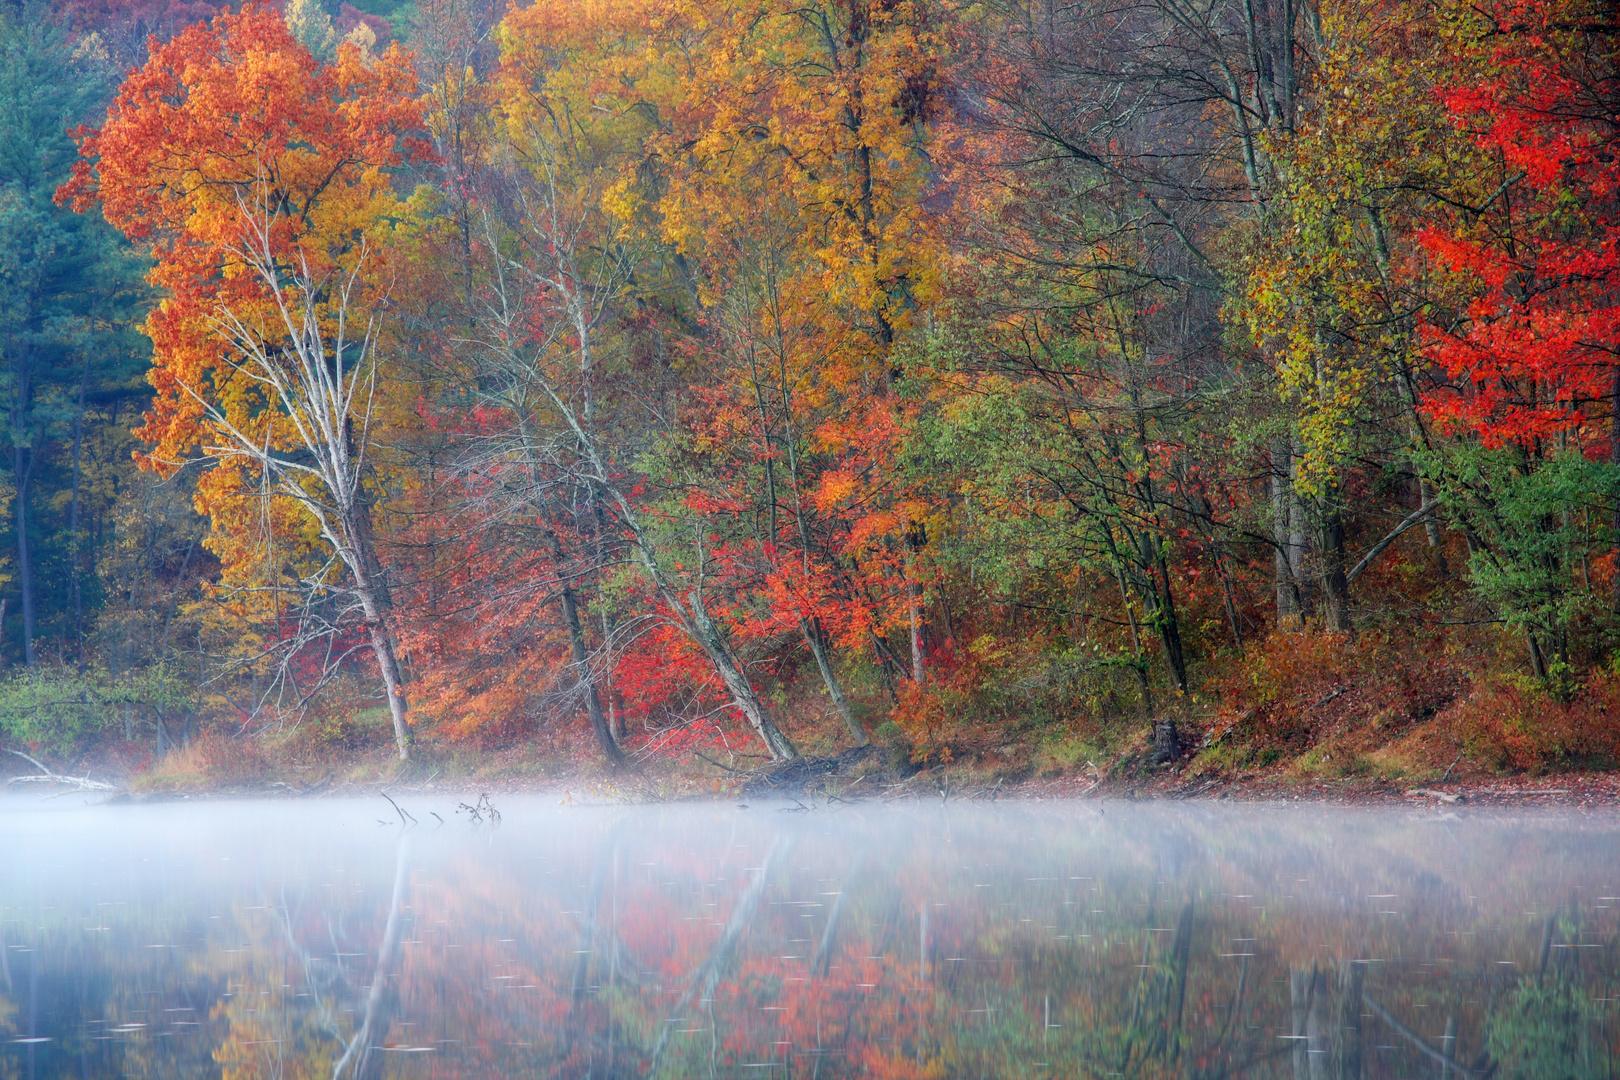 Autumn, Tar Hollow State Park, Ohio;